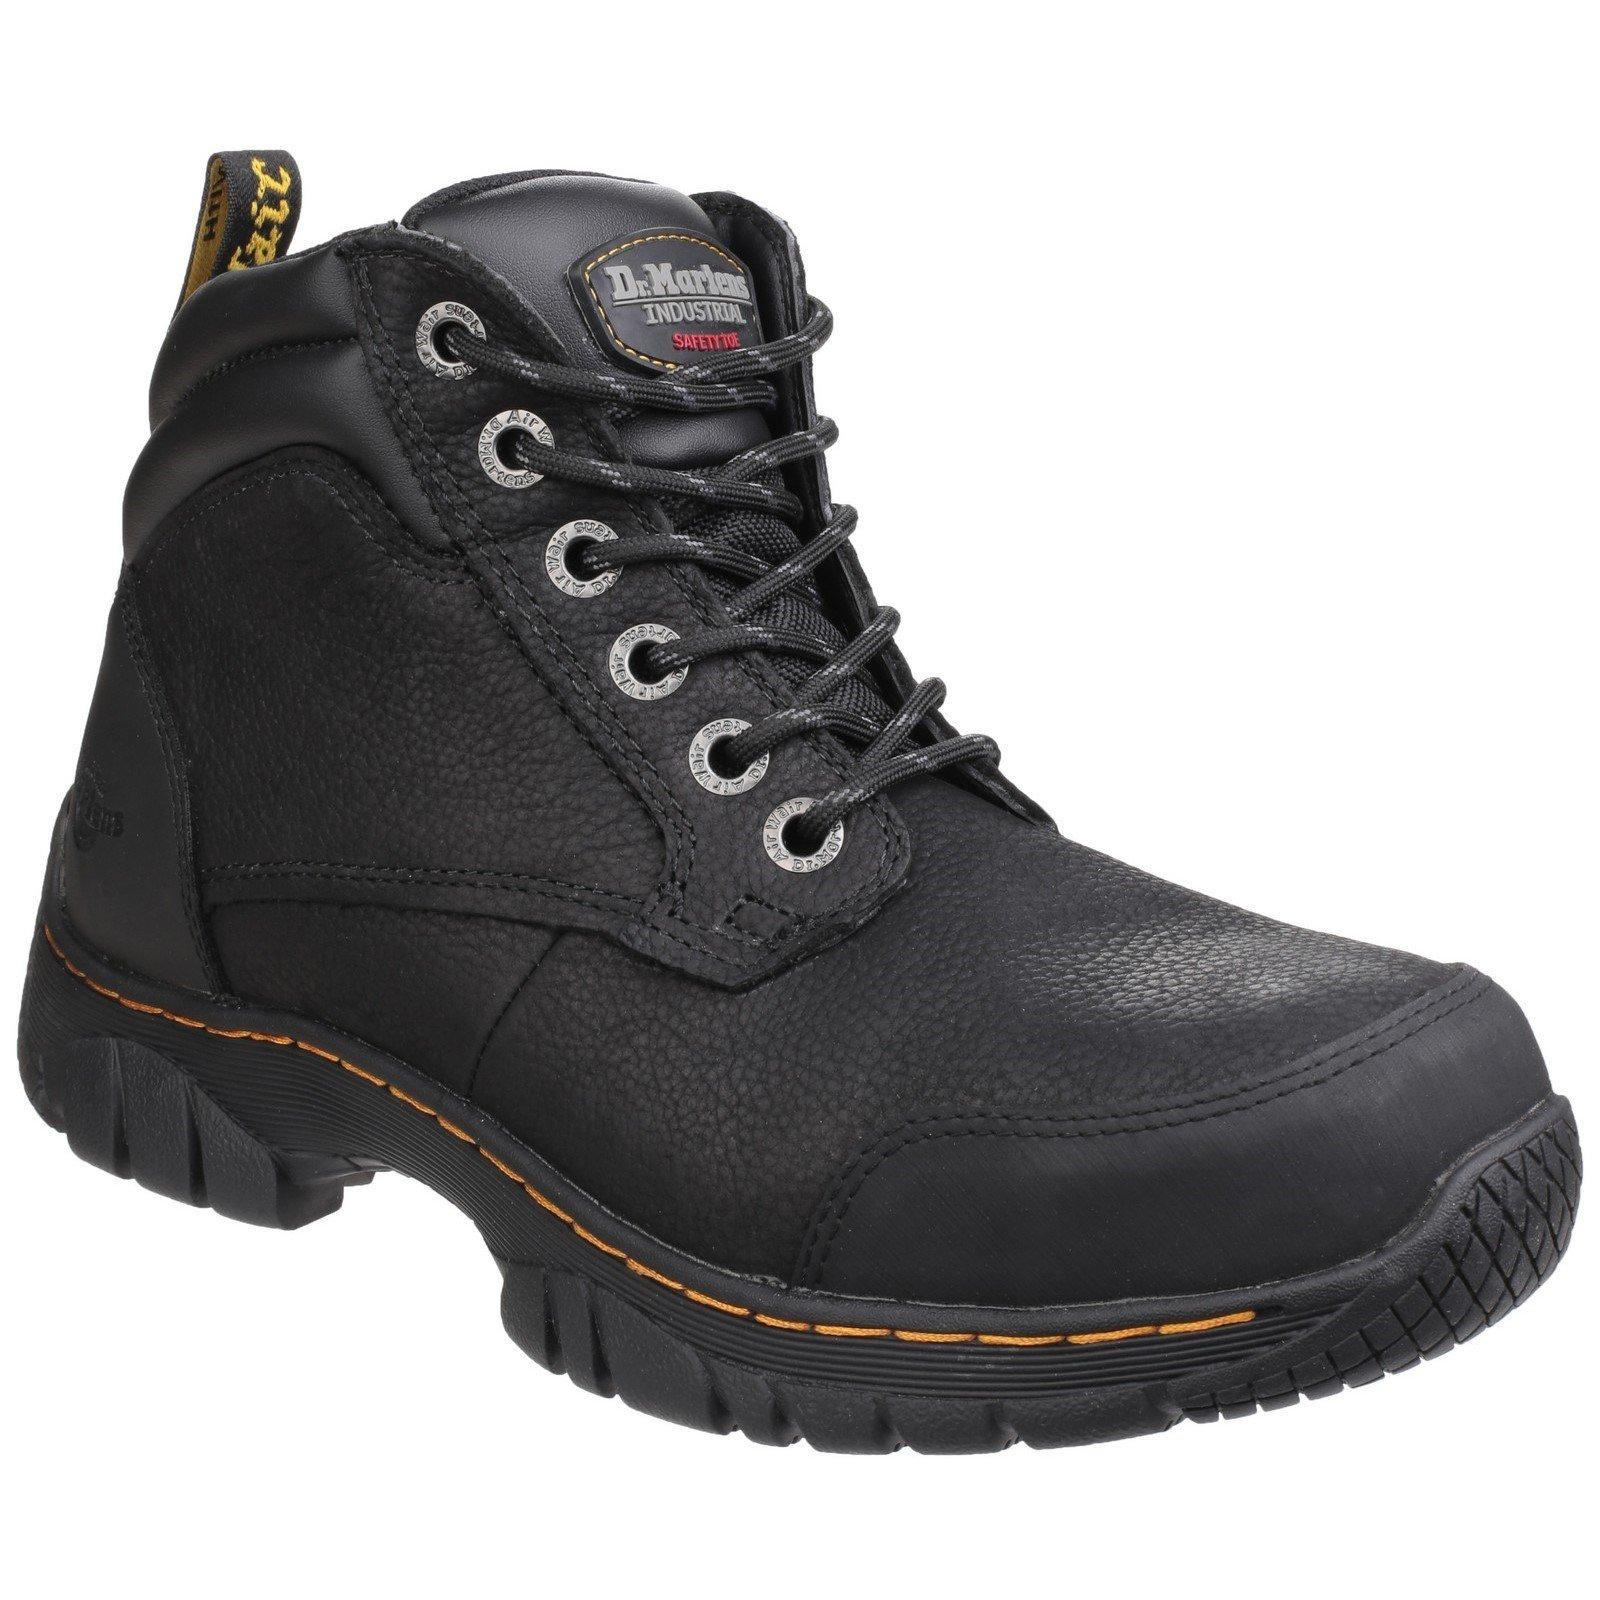 Dr Martens Unisex Riverton SB Lace up Hiker Boot Black 24533 - Black 5